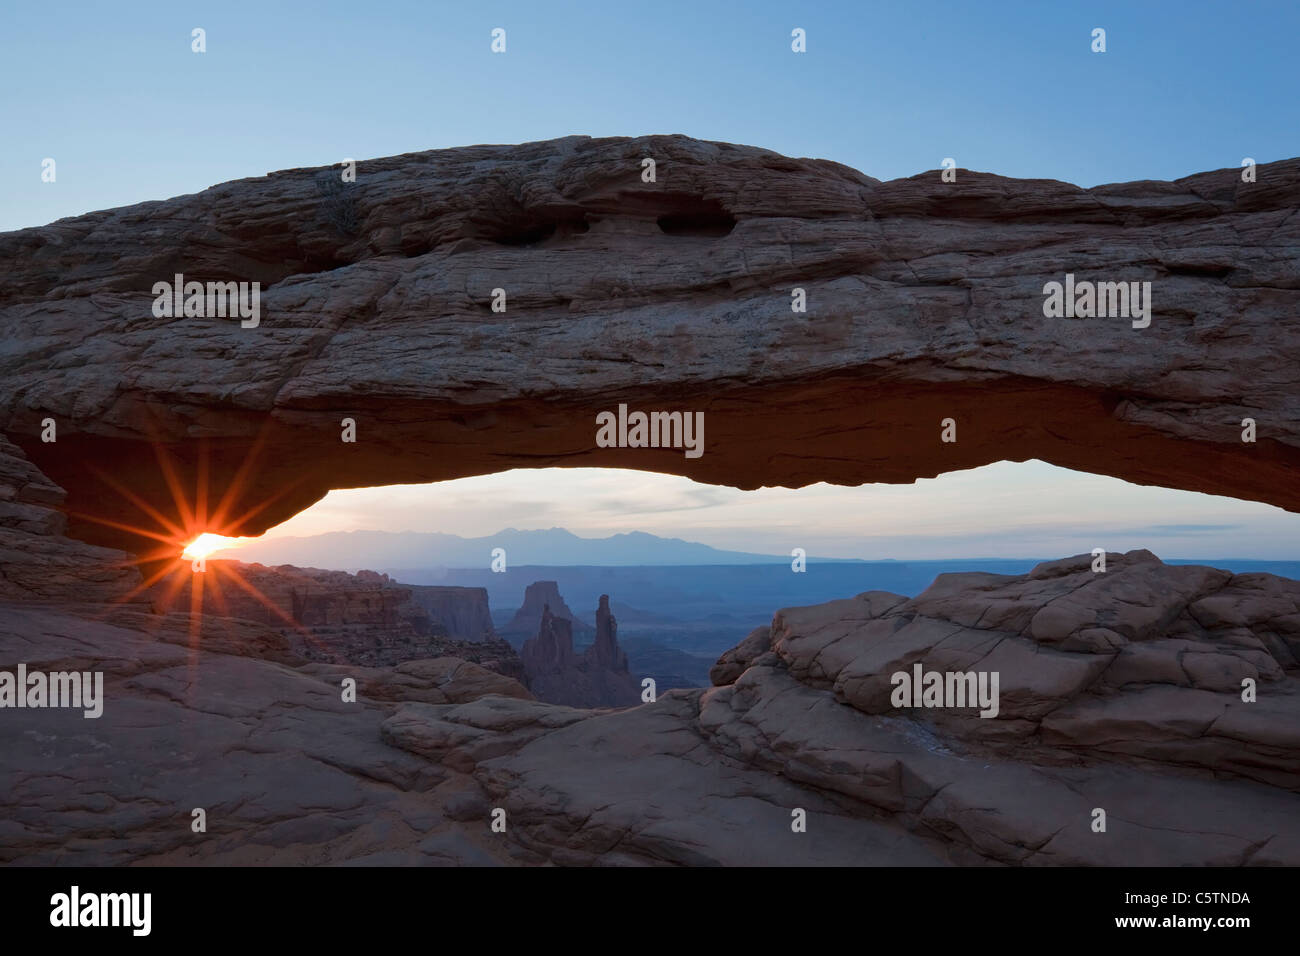 USA, Utah, Canyonlands National Park, Mesa Arch - Stock Image